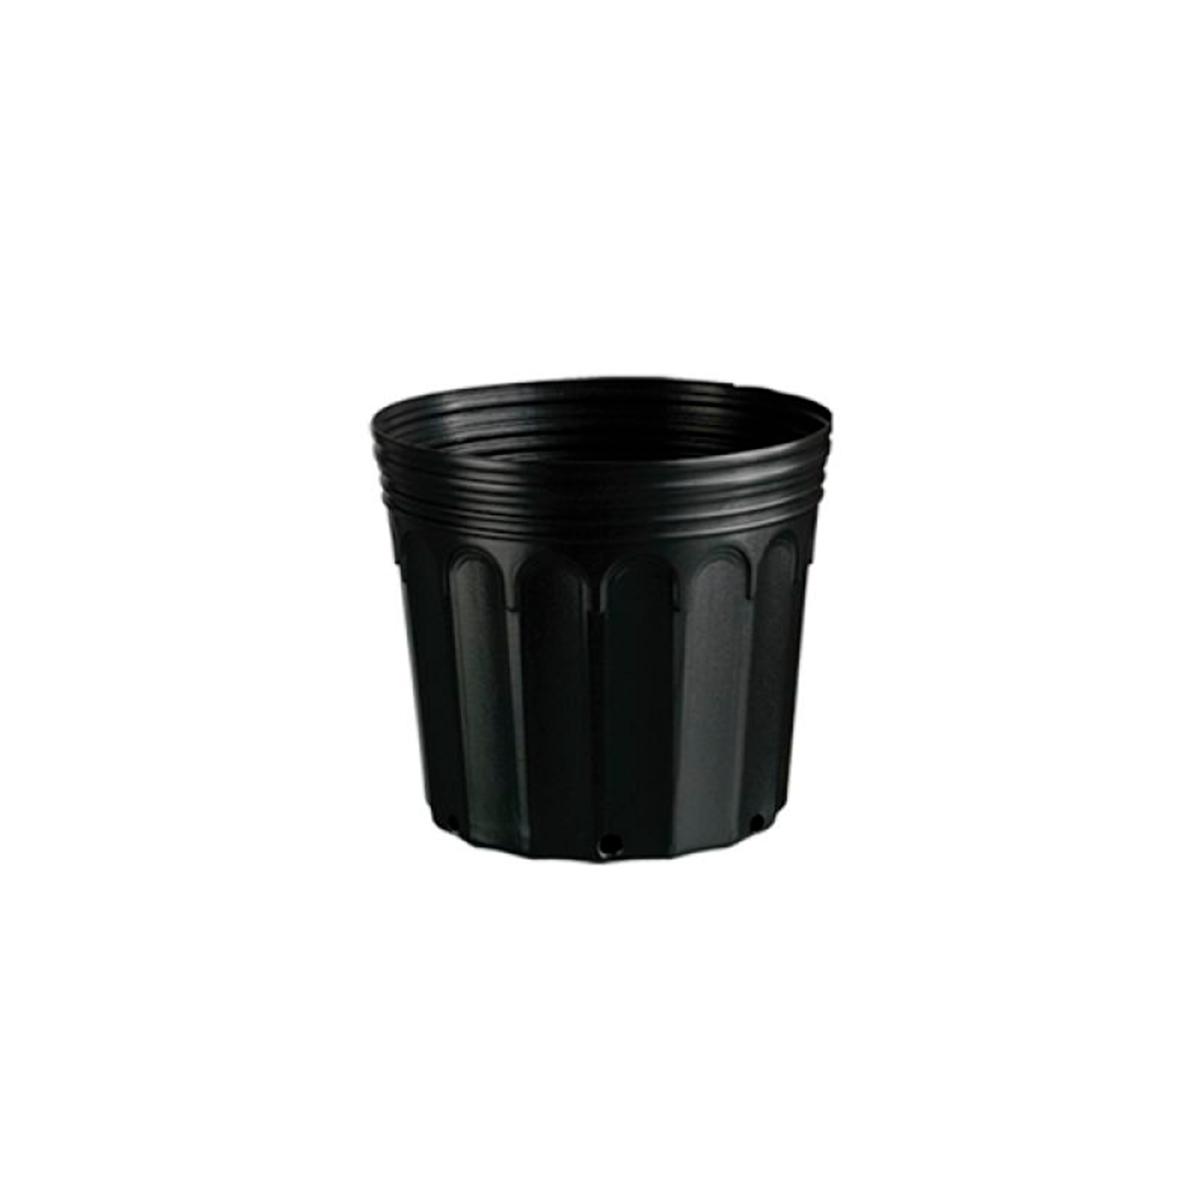 Kit 75 Embalagem para Mudas Flexível Plástico 8,5L